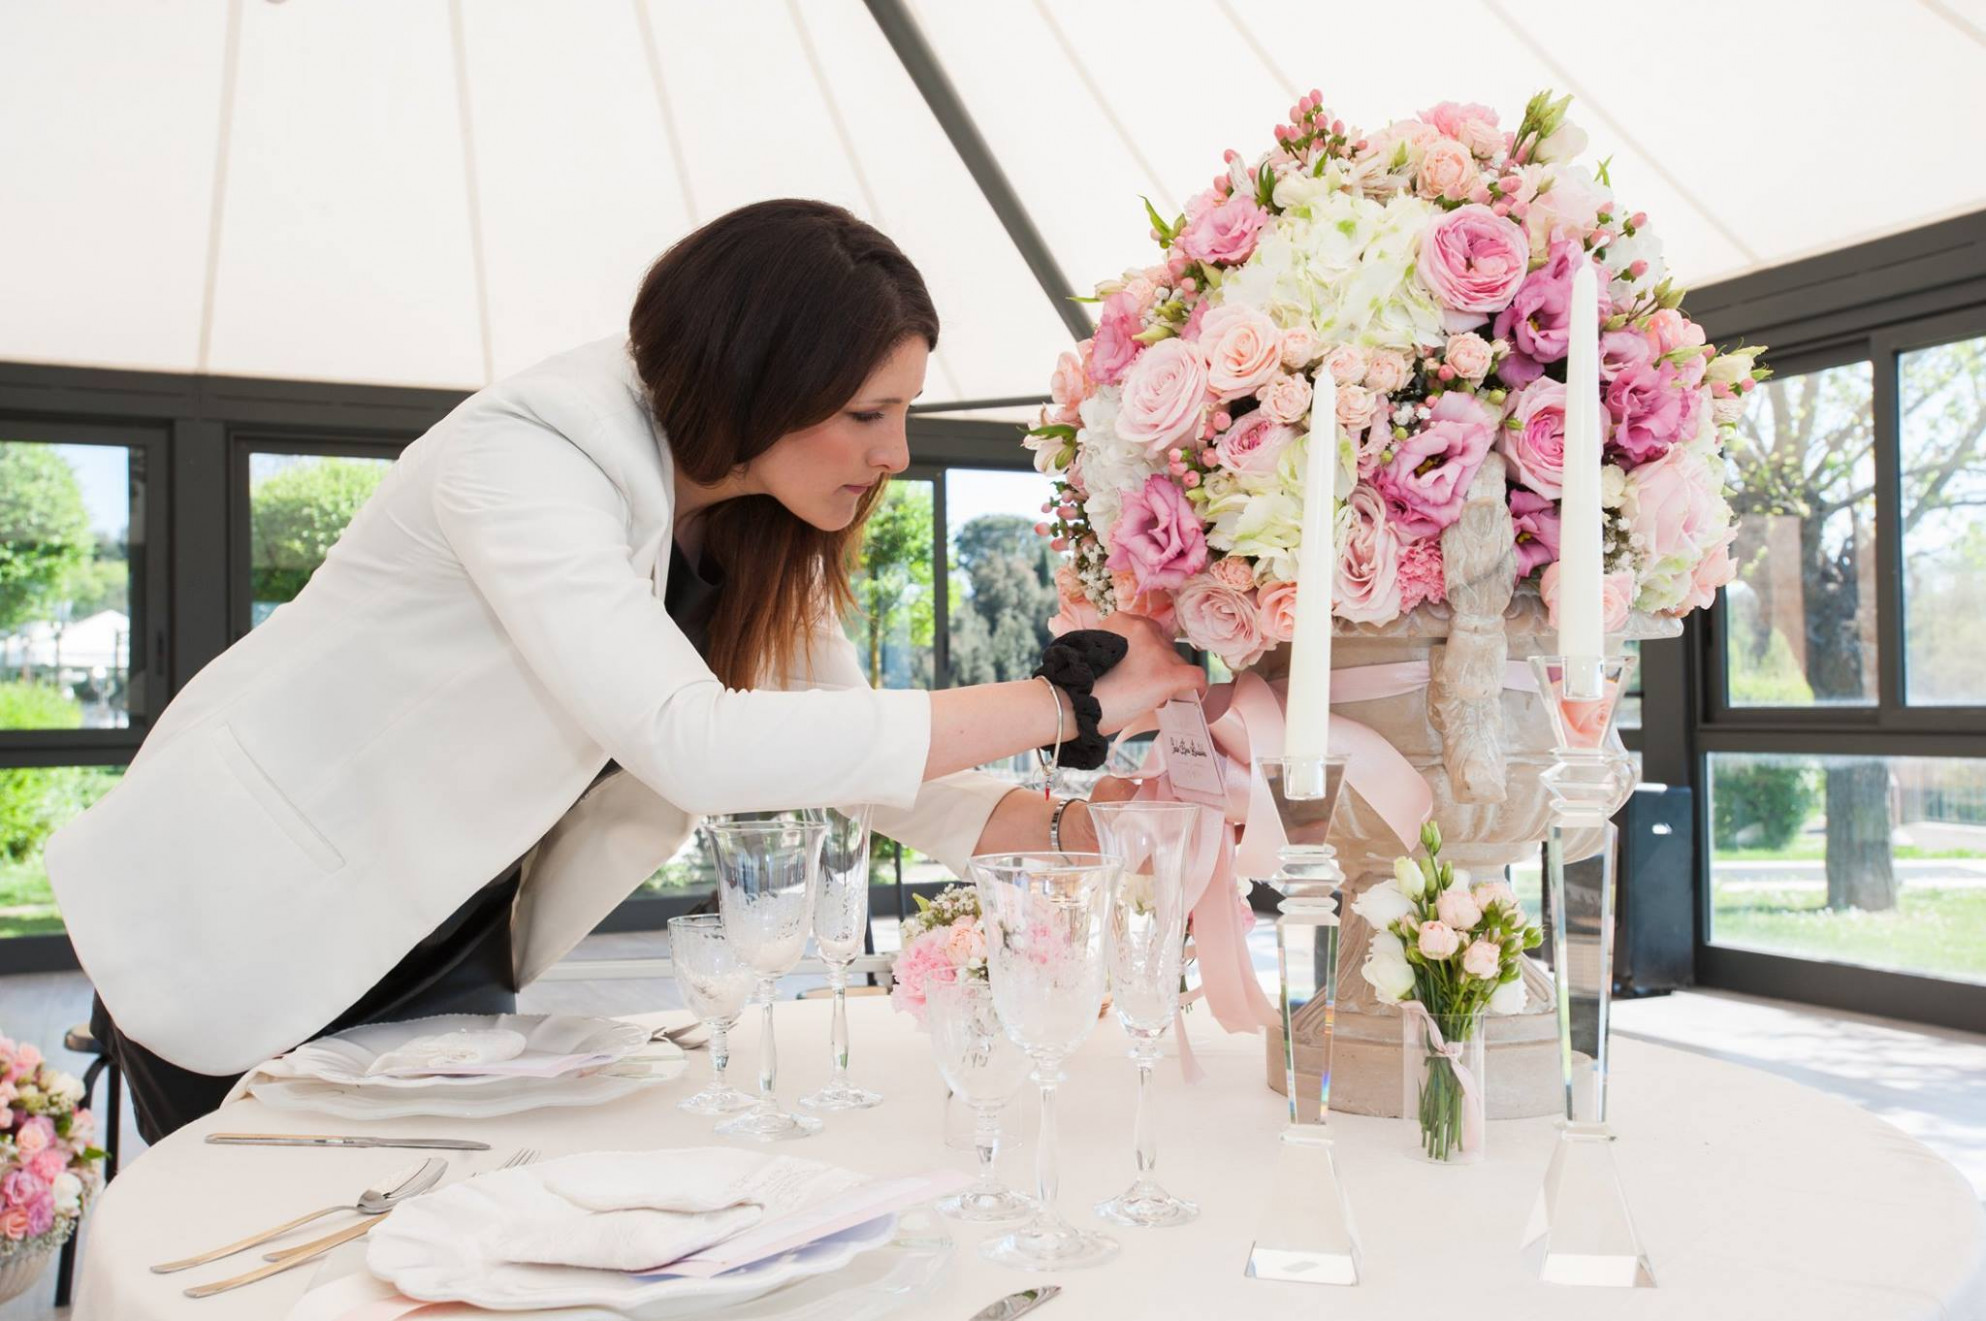 wedding decoration course